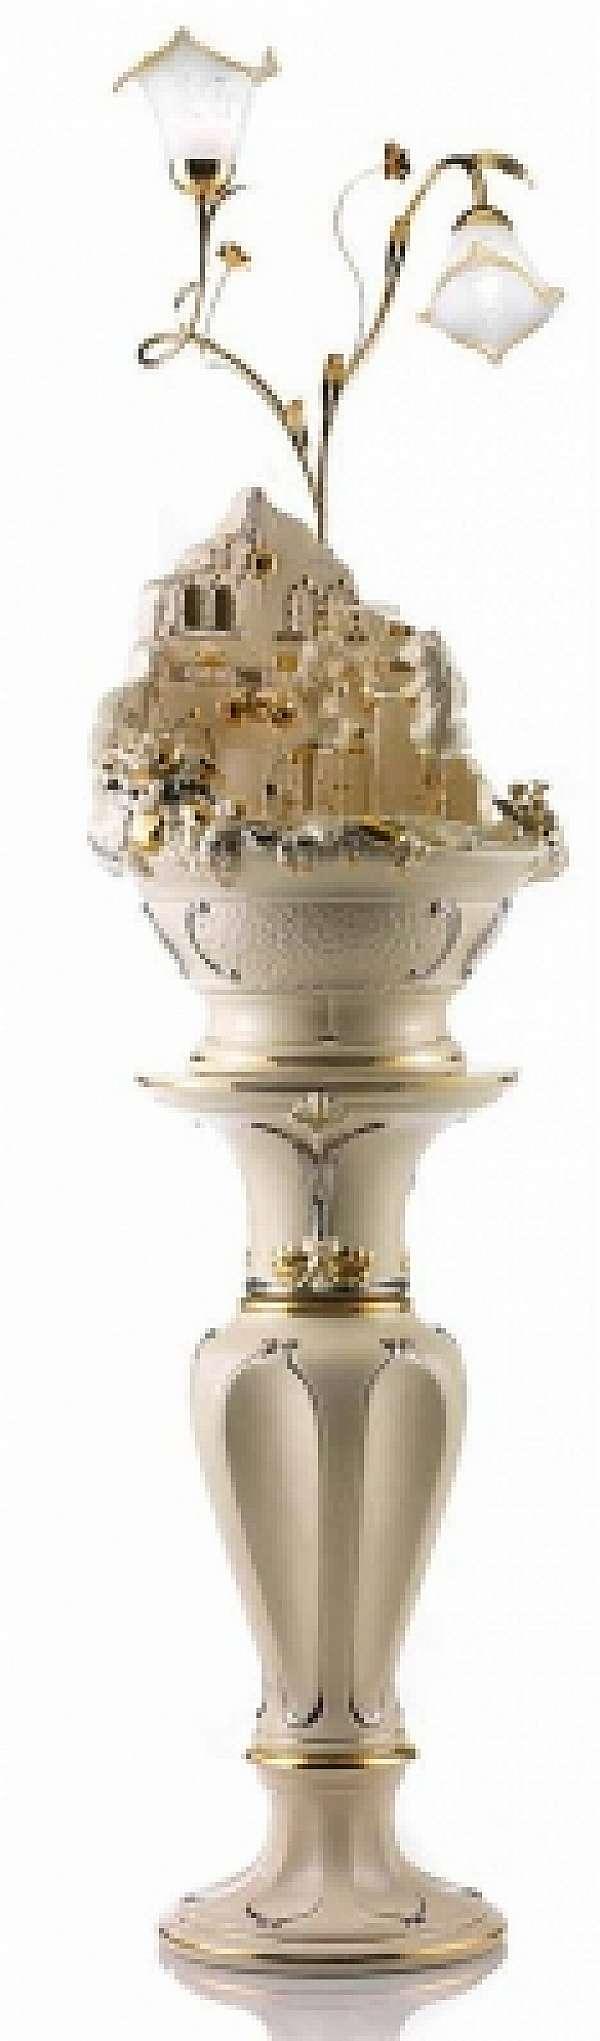 Напольная лампа LORENZON (F.LLI LORENZON) L.923/AVOPLF ARTE E CERAMICA